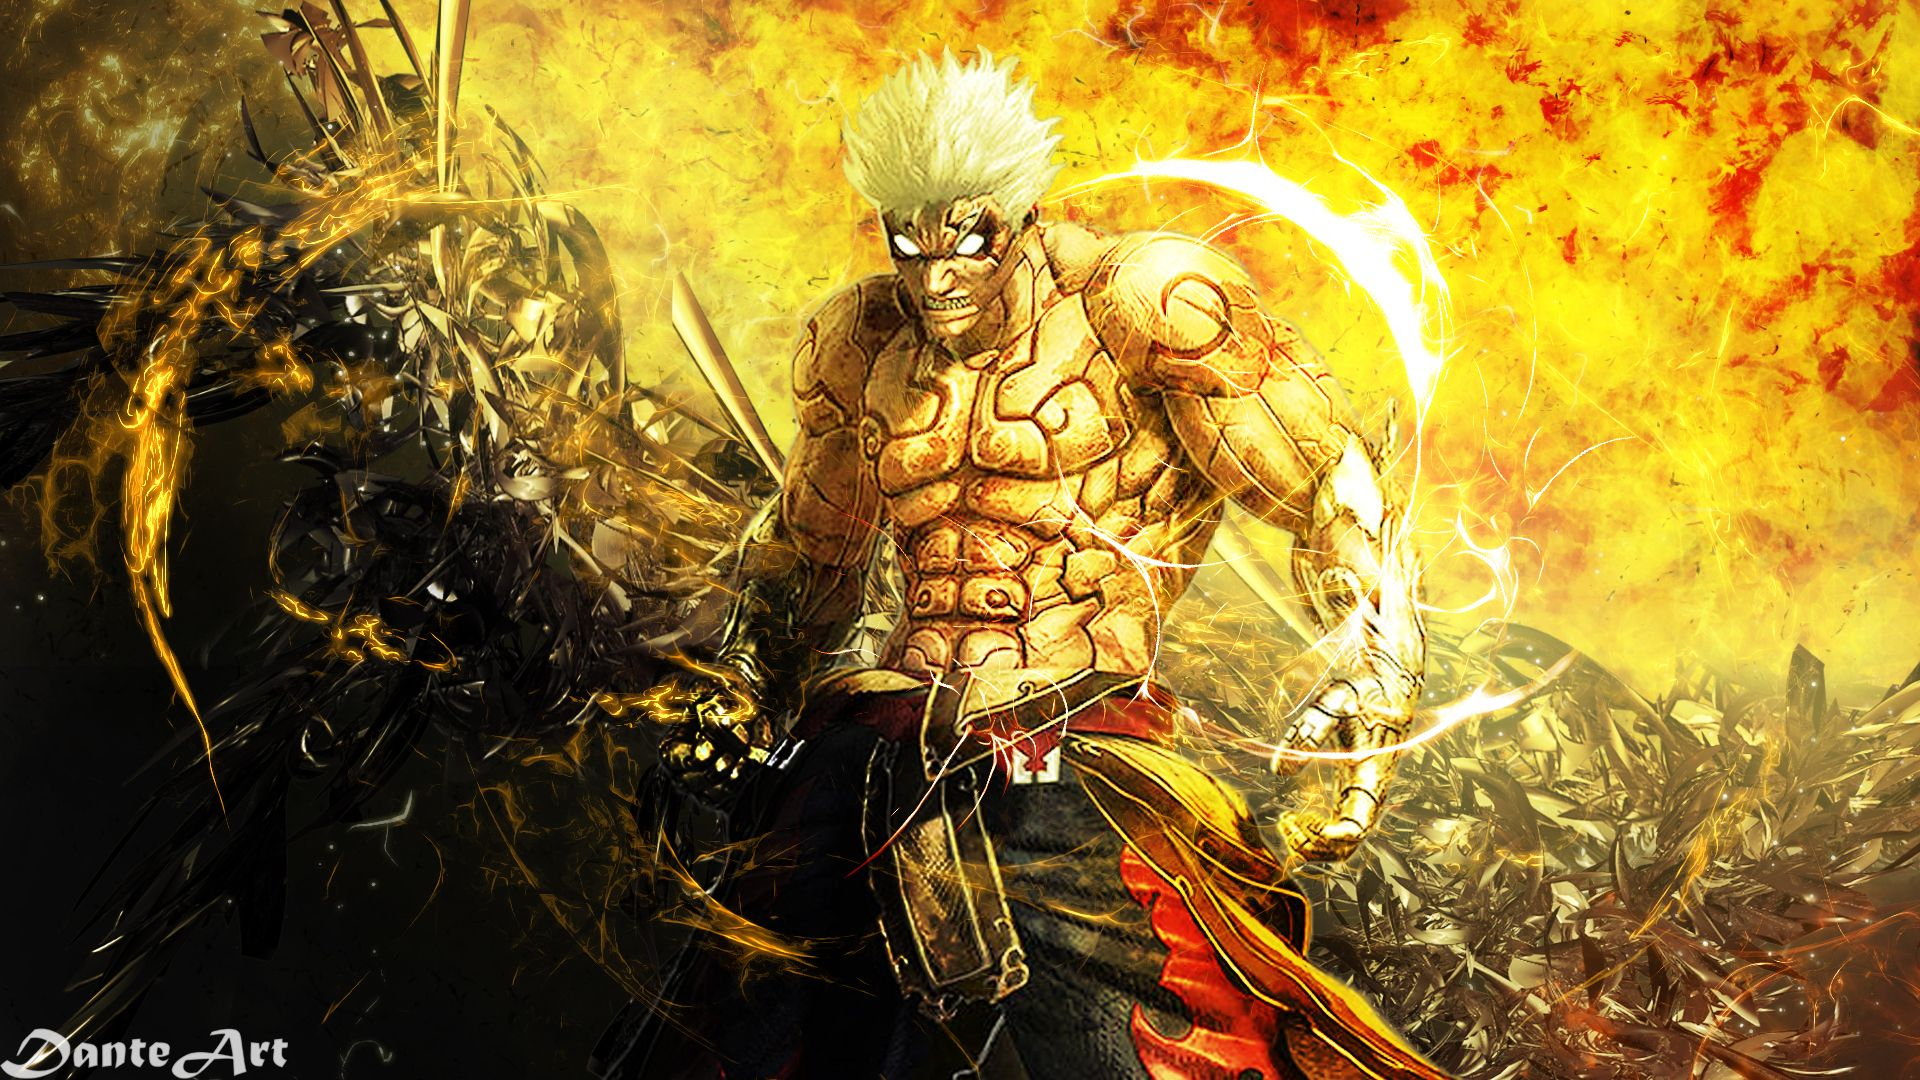 Asuras Wrath Asura Hd Desktop Wallpaper High Definition Asura S Wrath Wrath Wallpaper